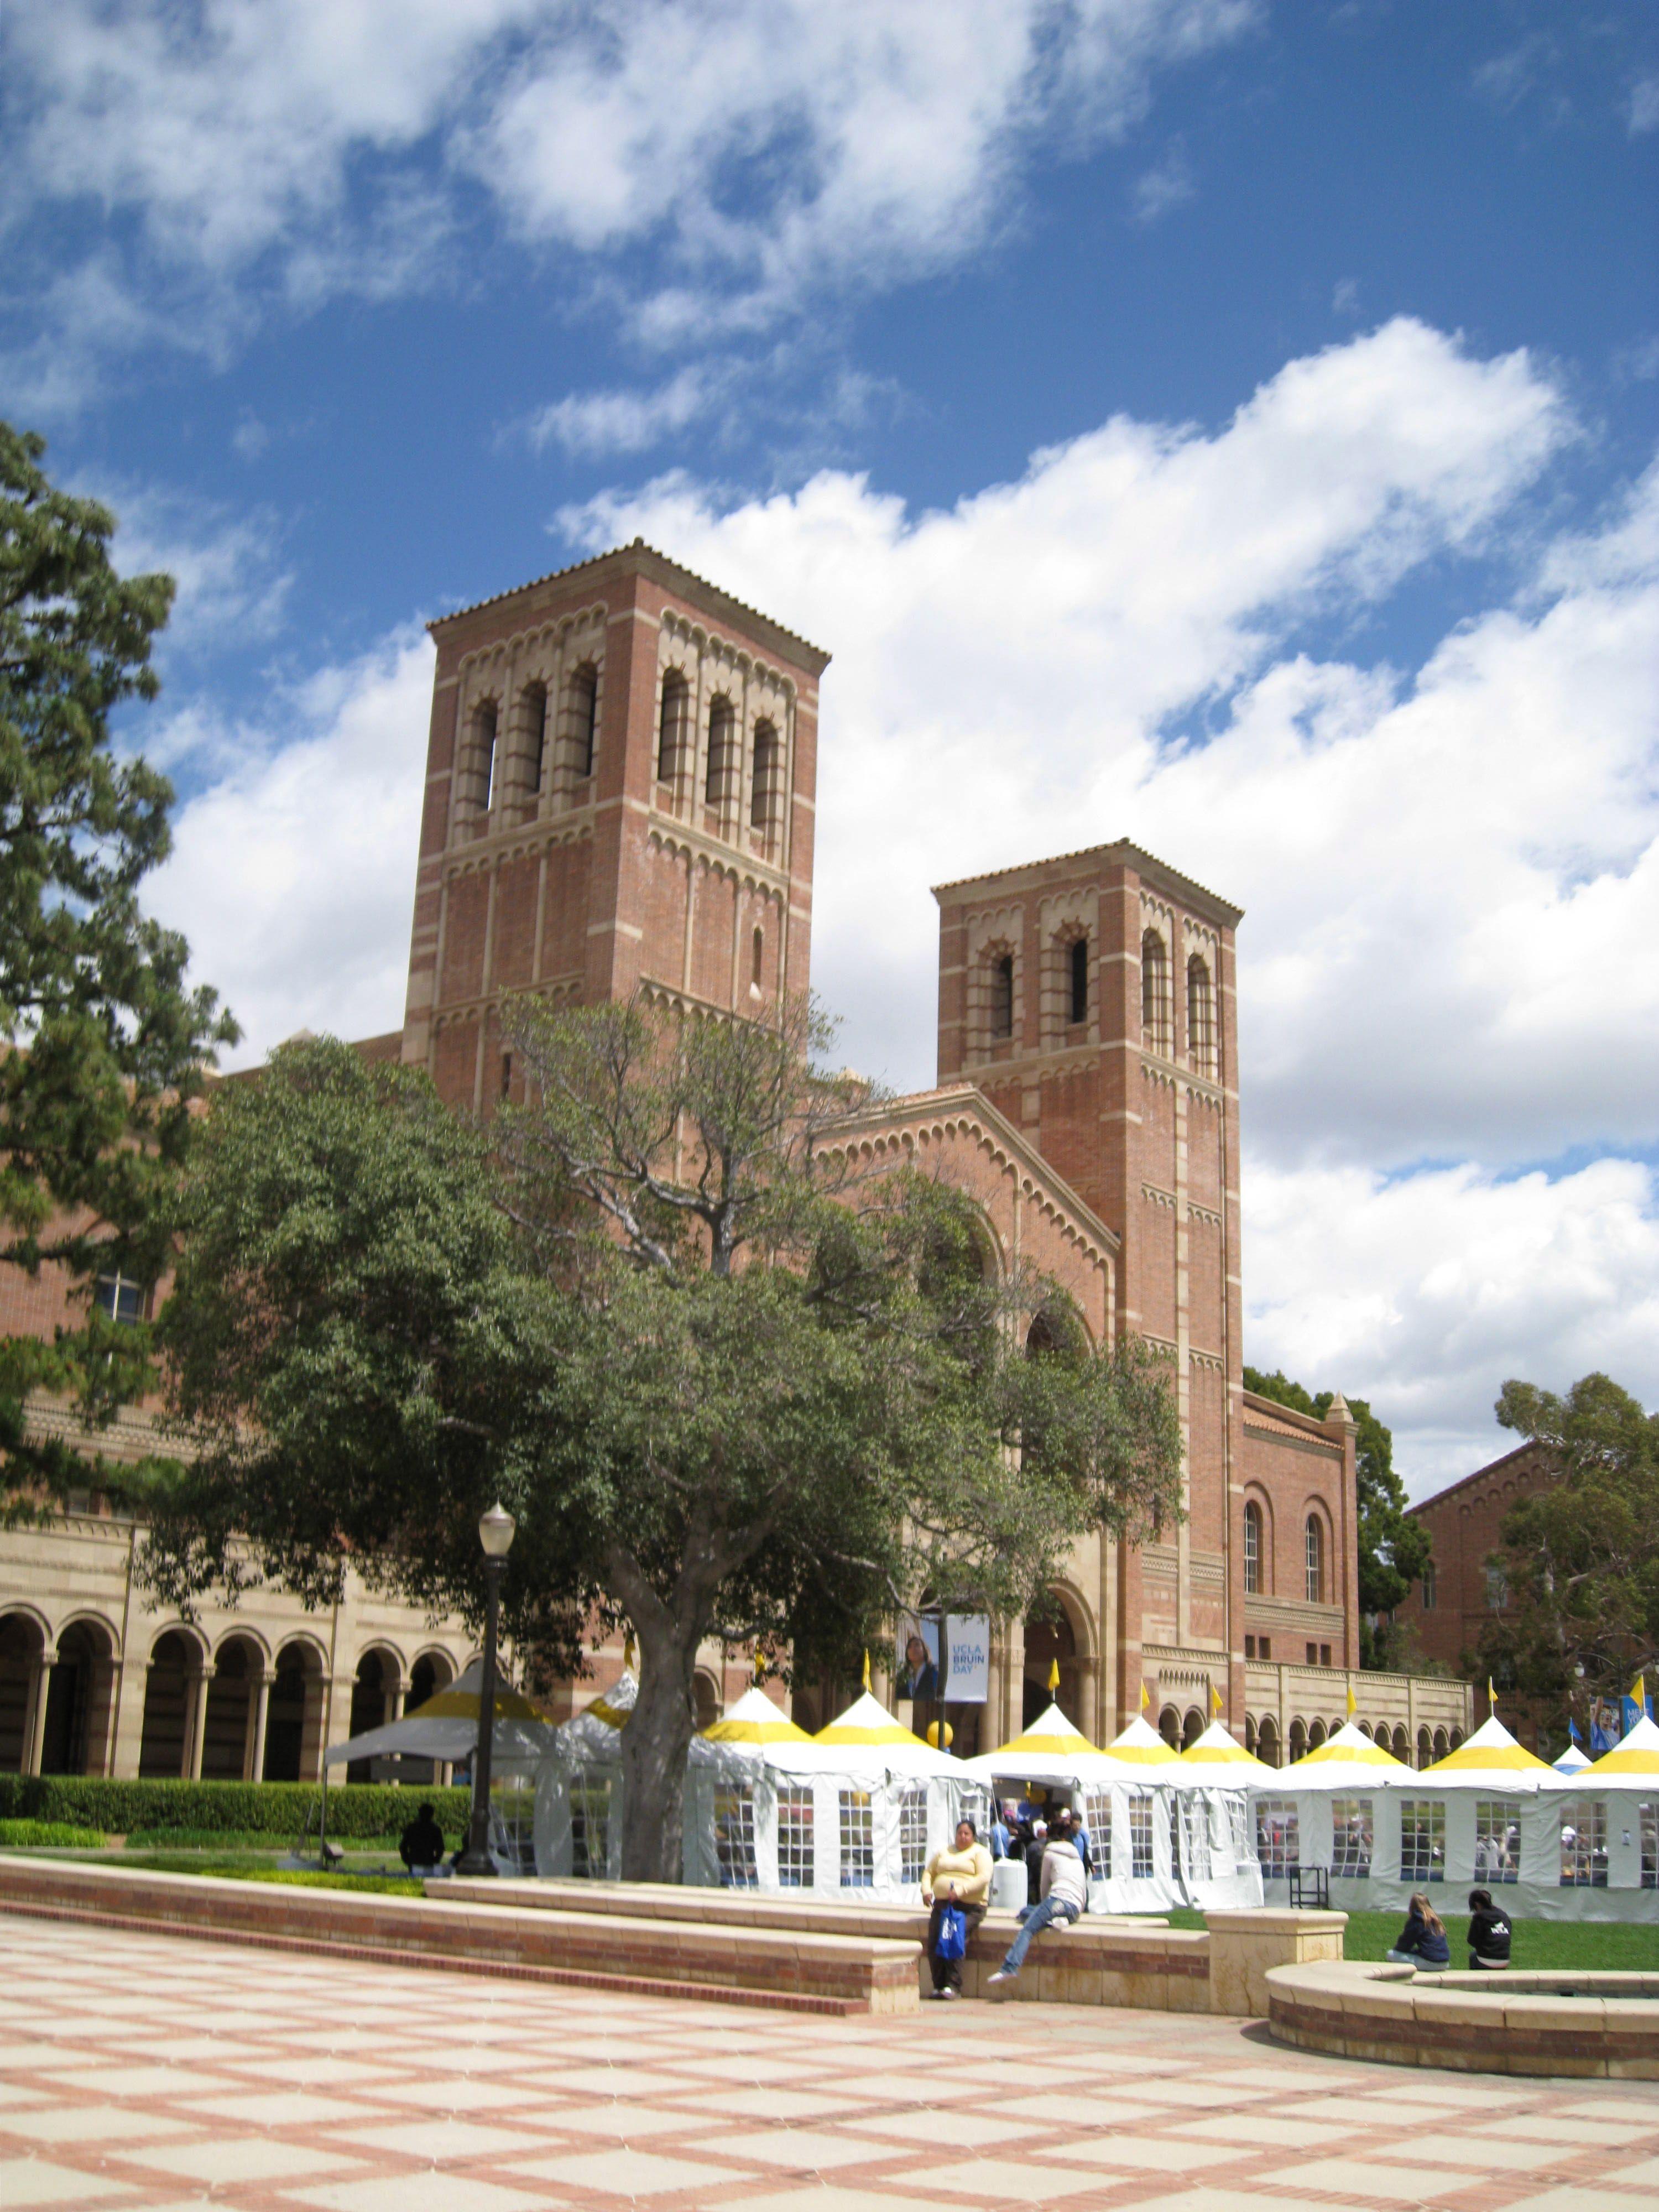 University Of California Los Angeles California University Of California Los Angeles Ucla Campus University Of California